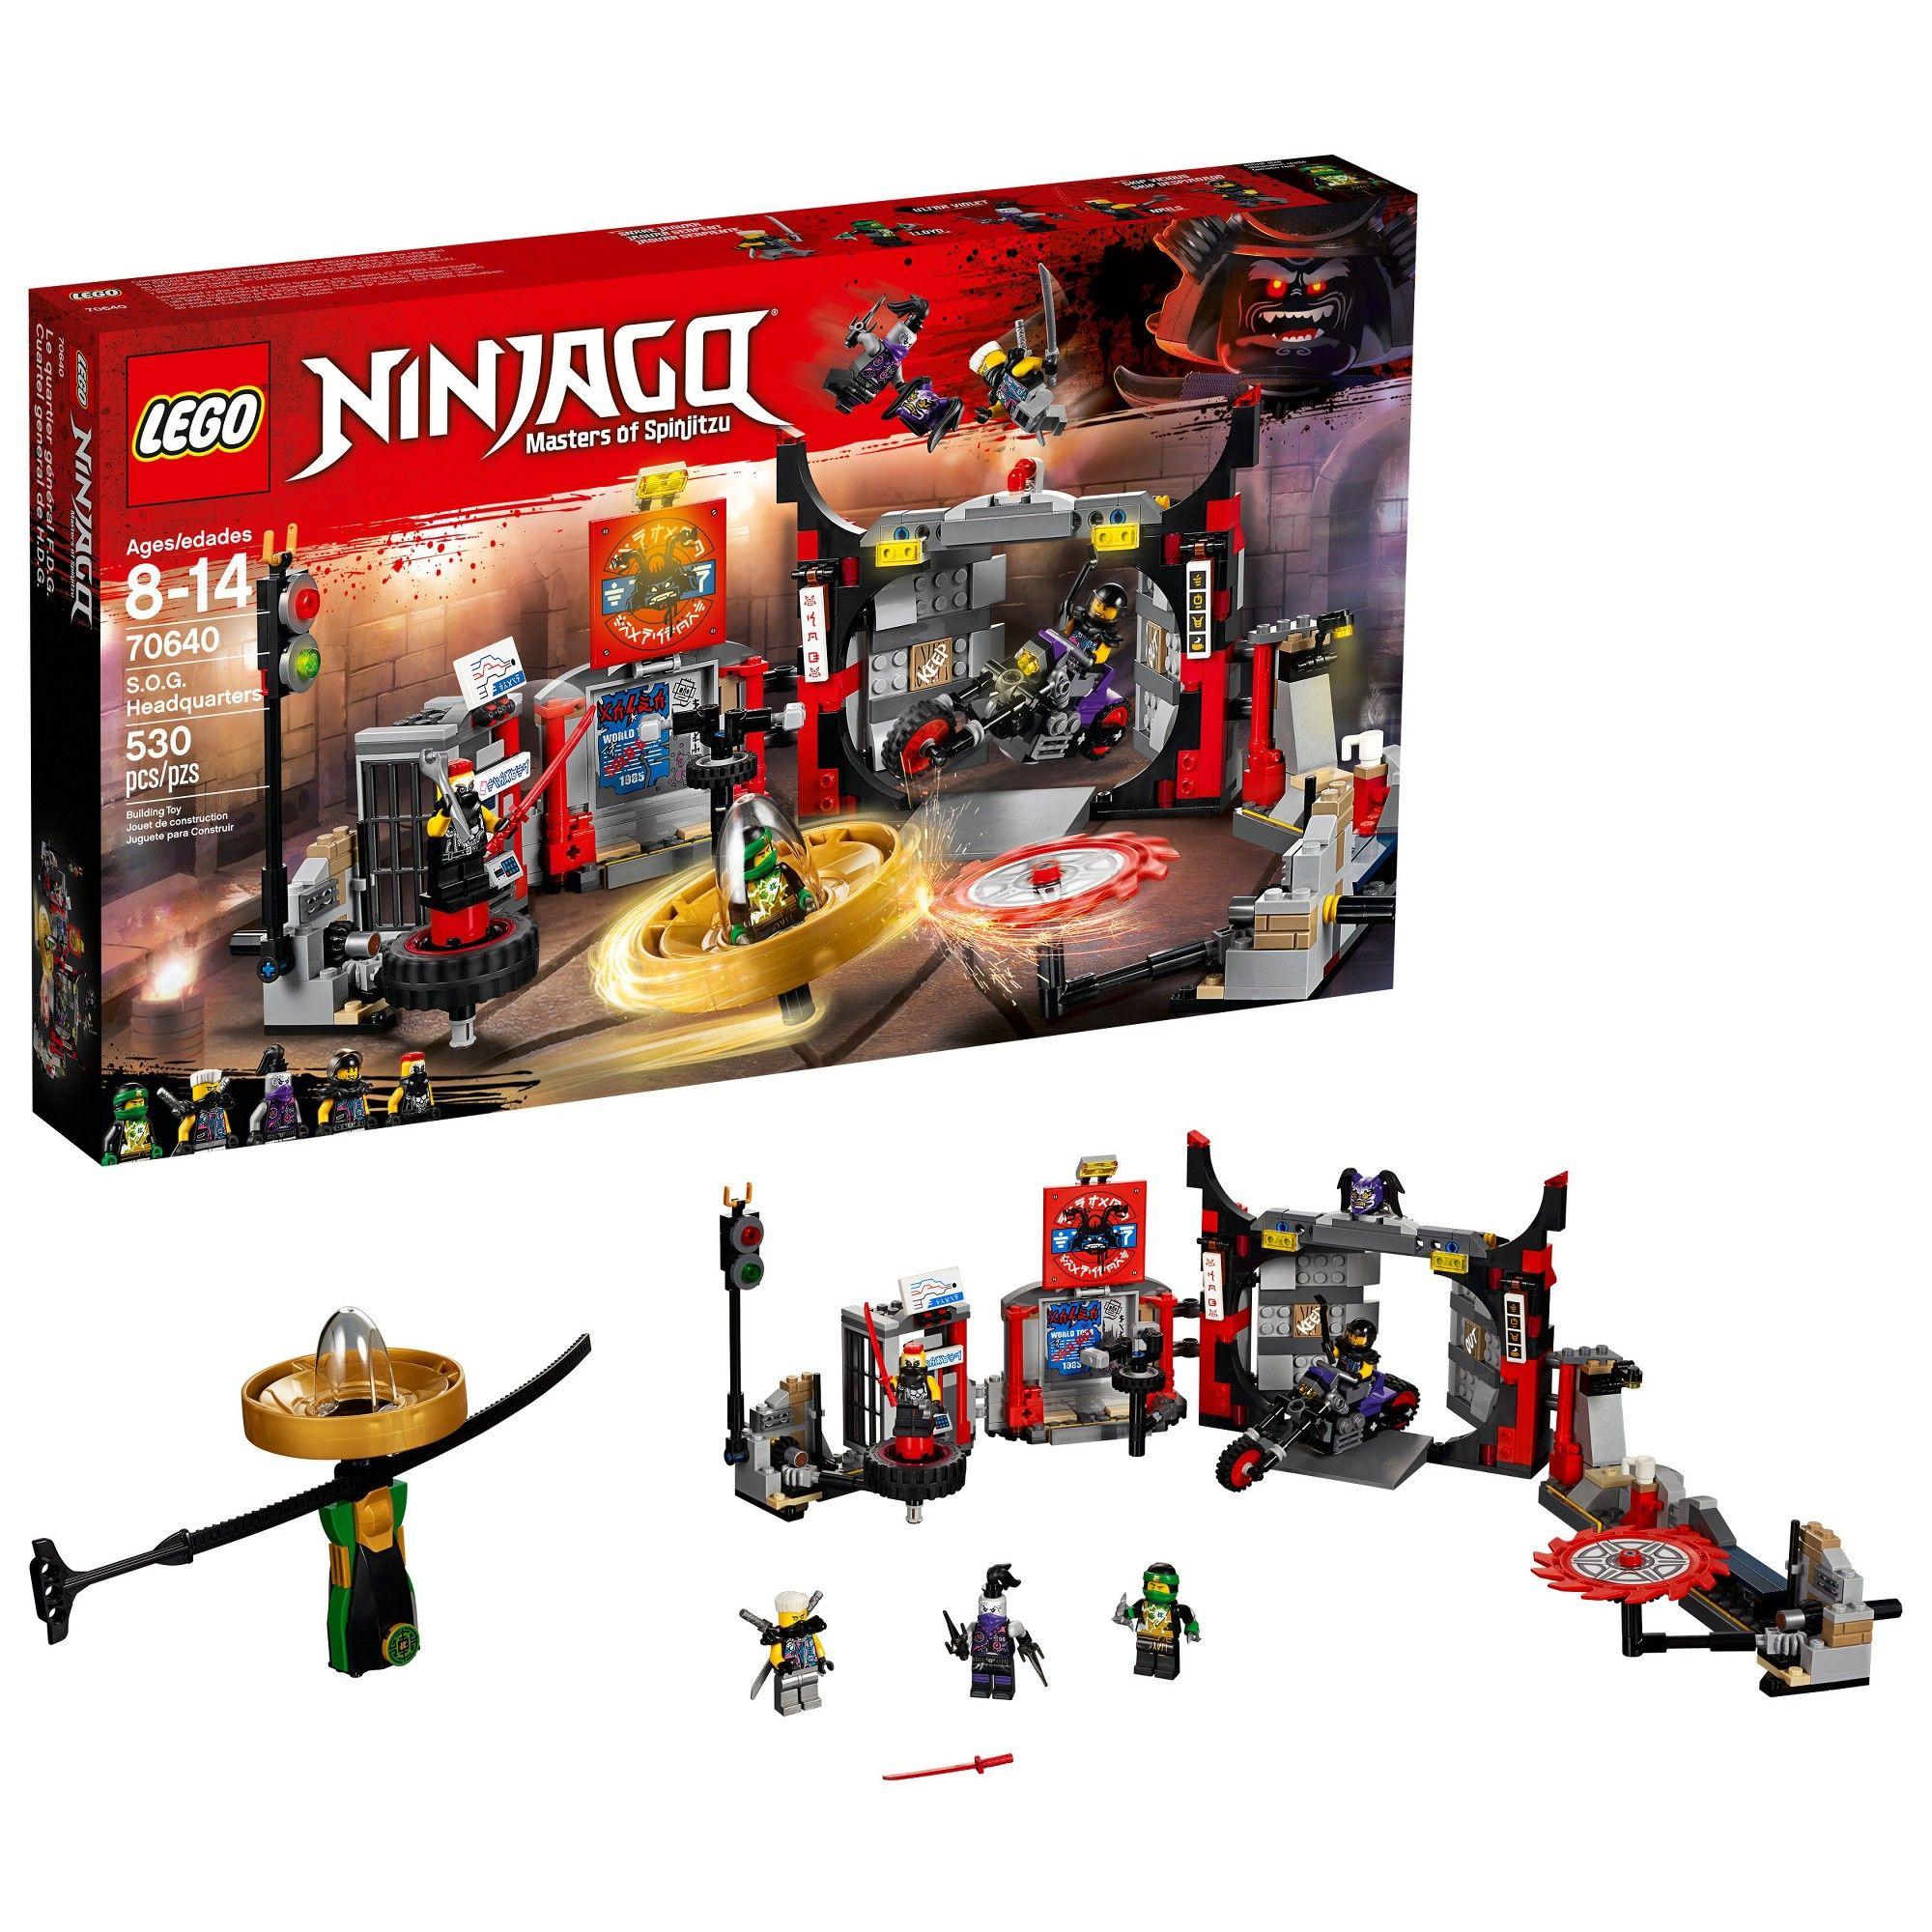 Lego Lloyd Box Afflink Alarm Rare New Ninjago Zx Clock In 4RA5jL